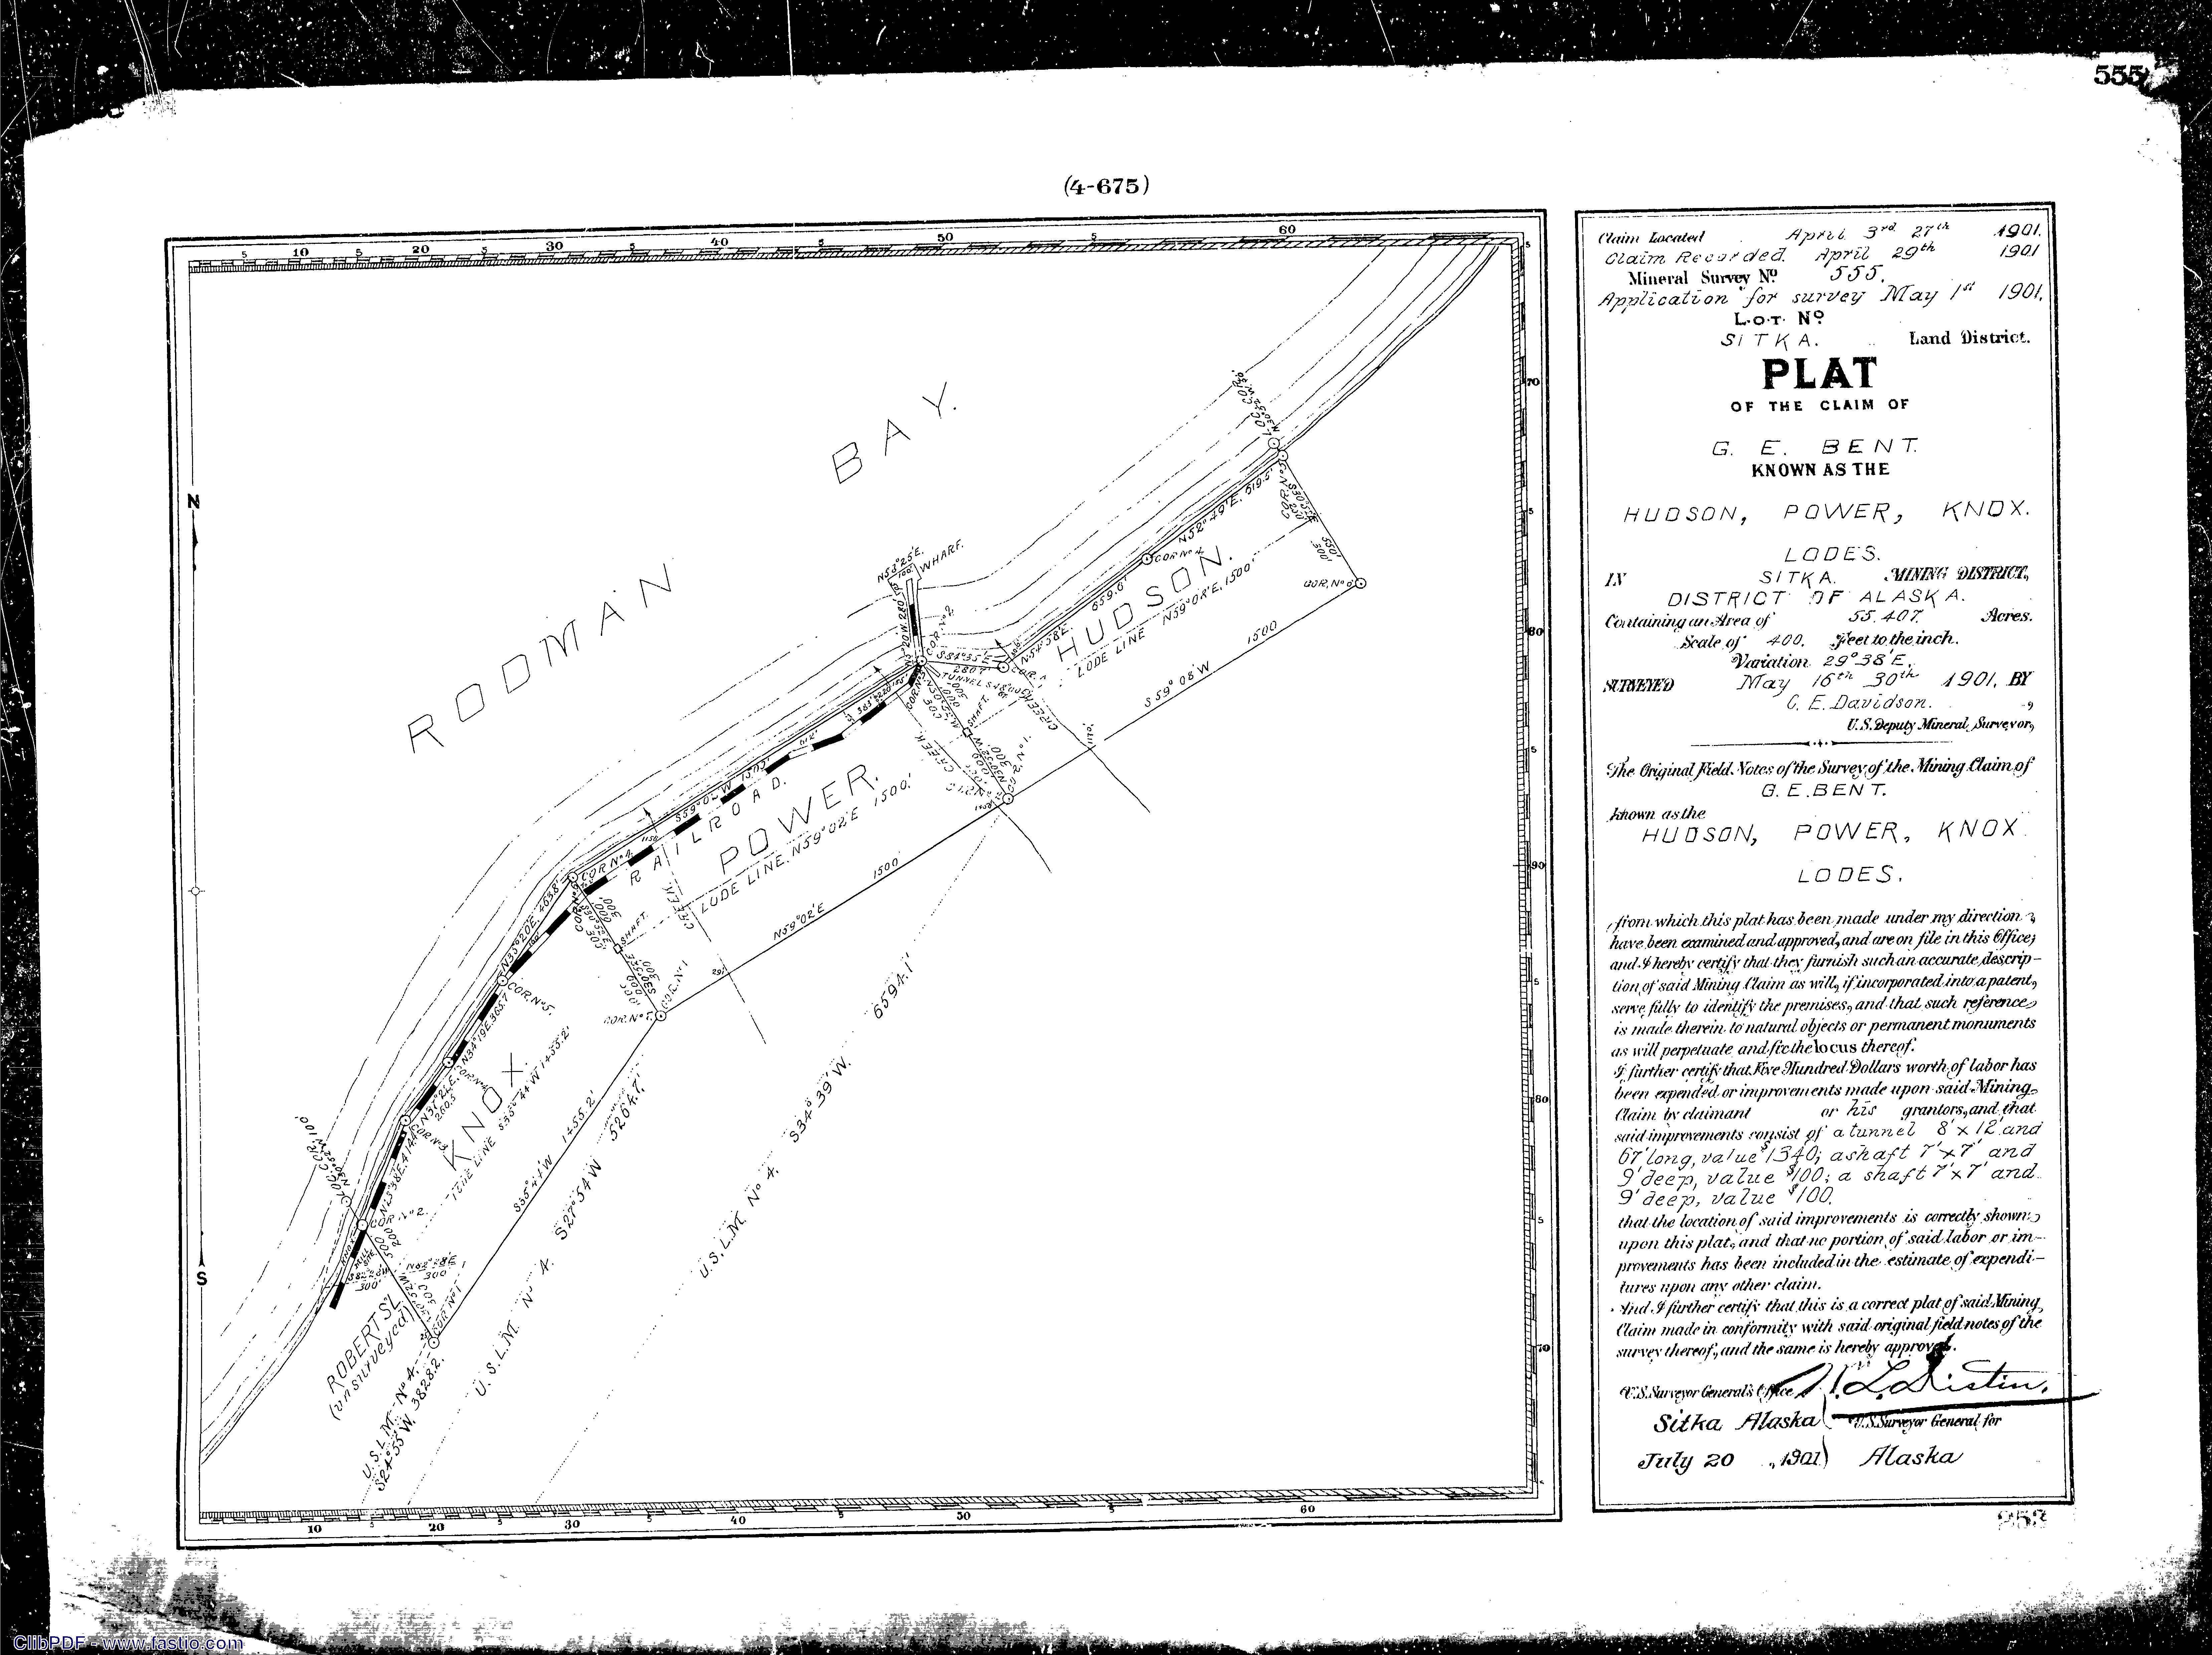 rodman2?w=450&h=336 lesser known and obscure railroads of alaska saveitforparts  at honlapkeszites.co